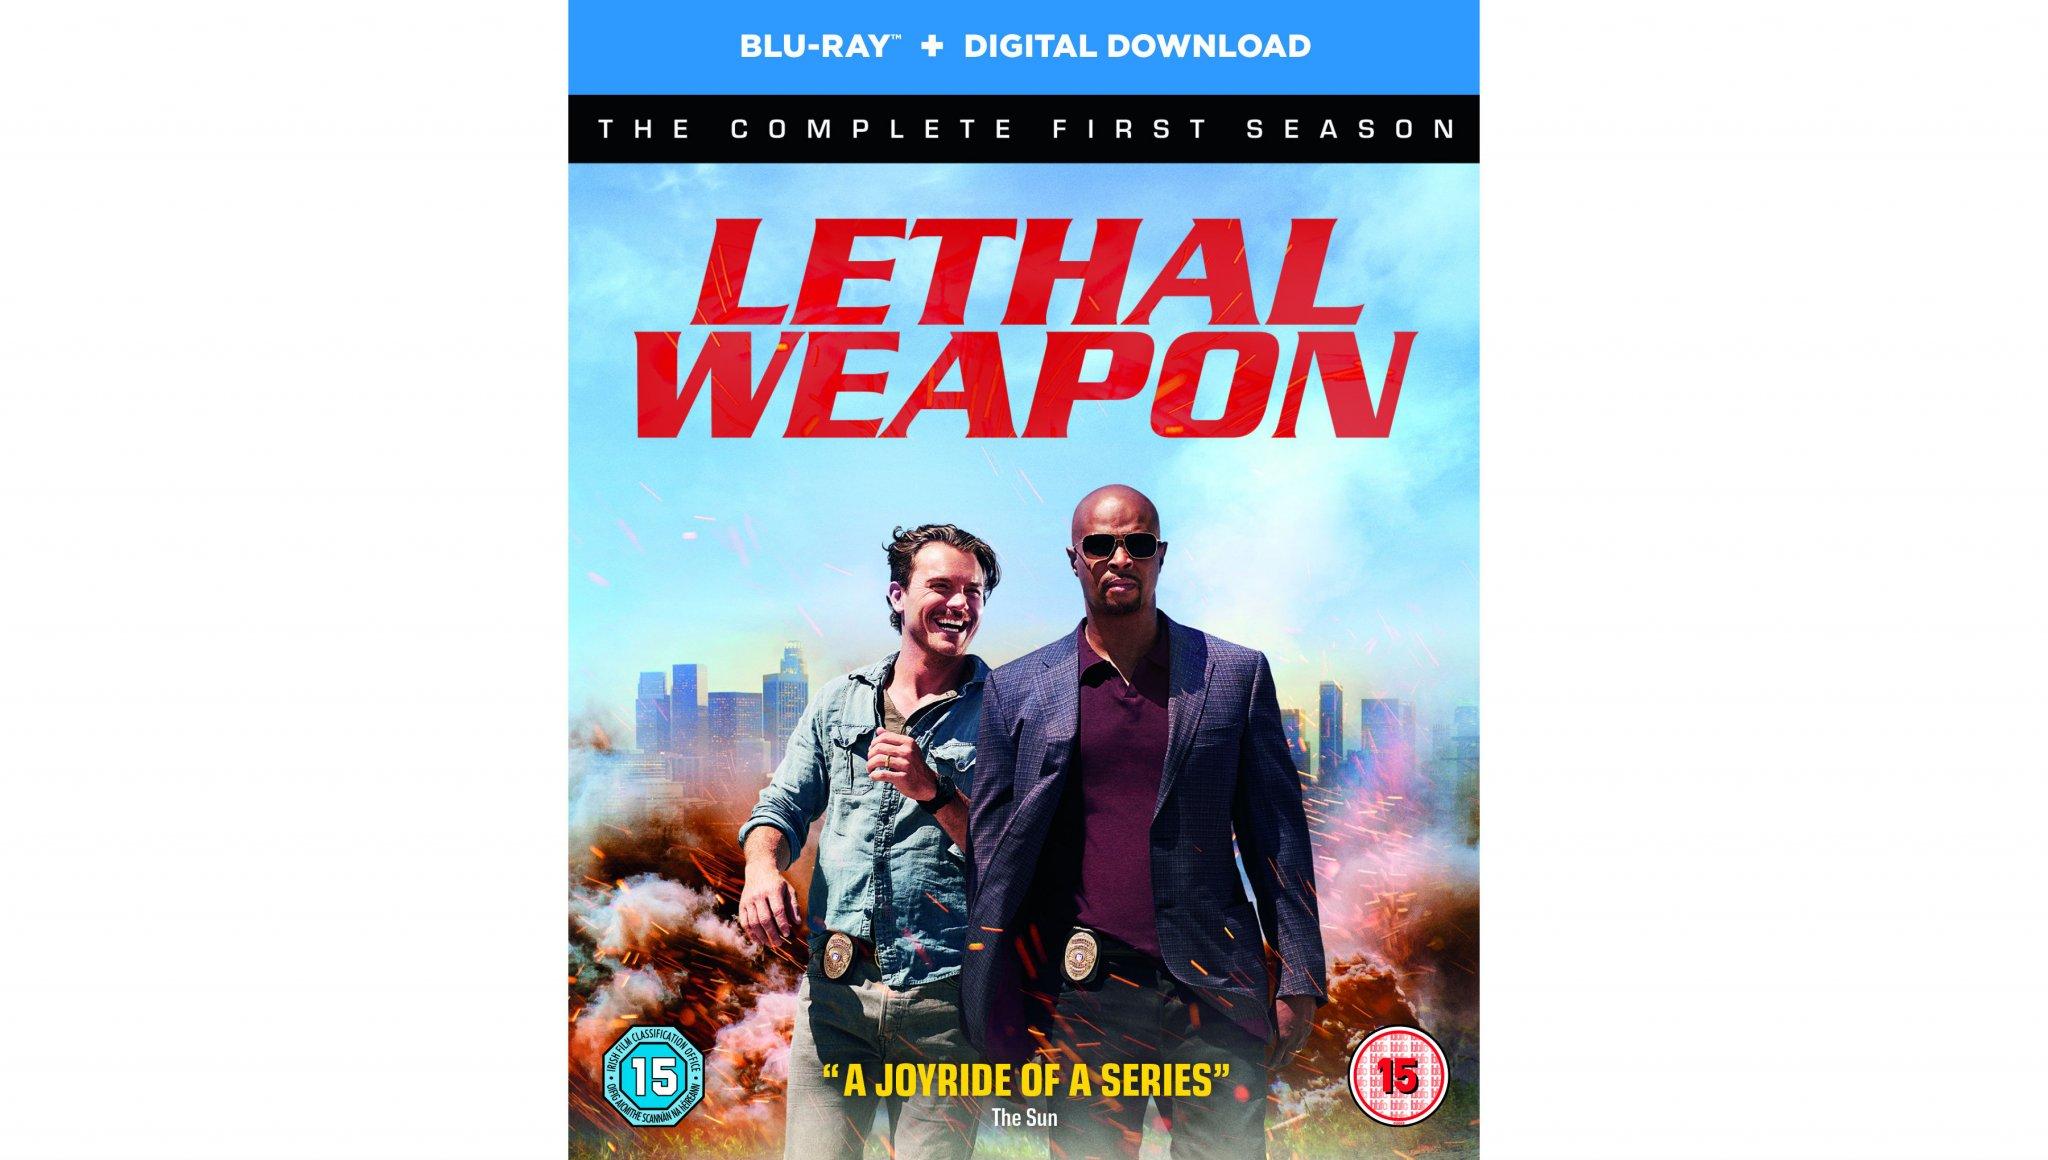 Lethal weapon full season